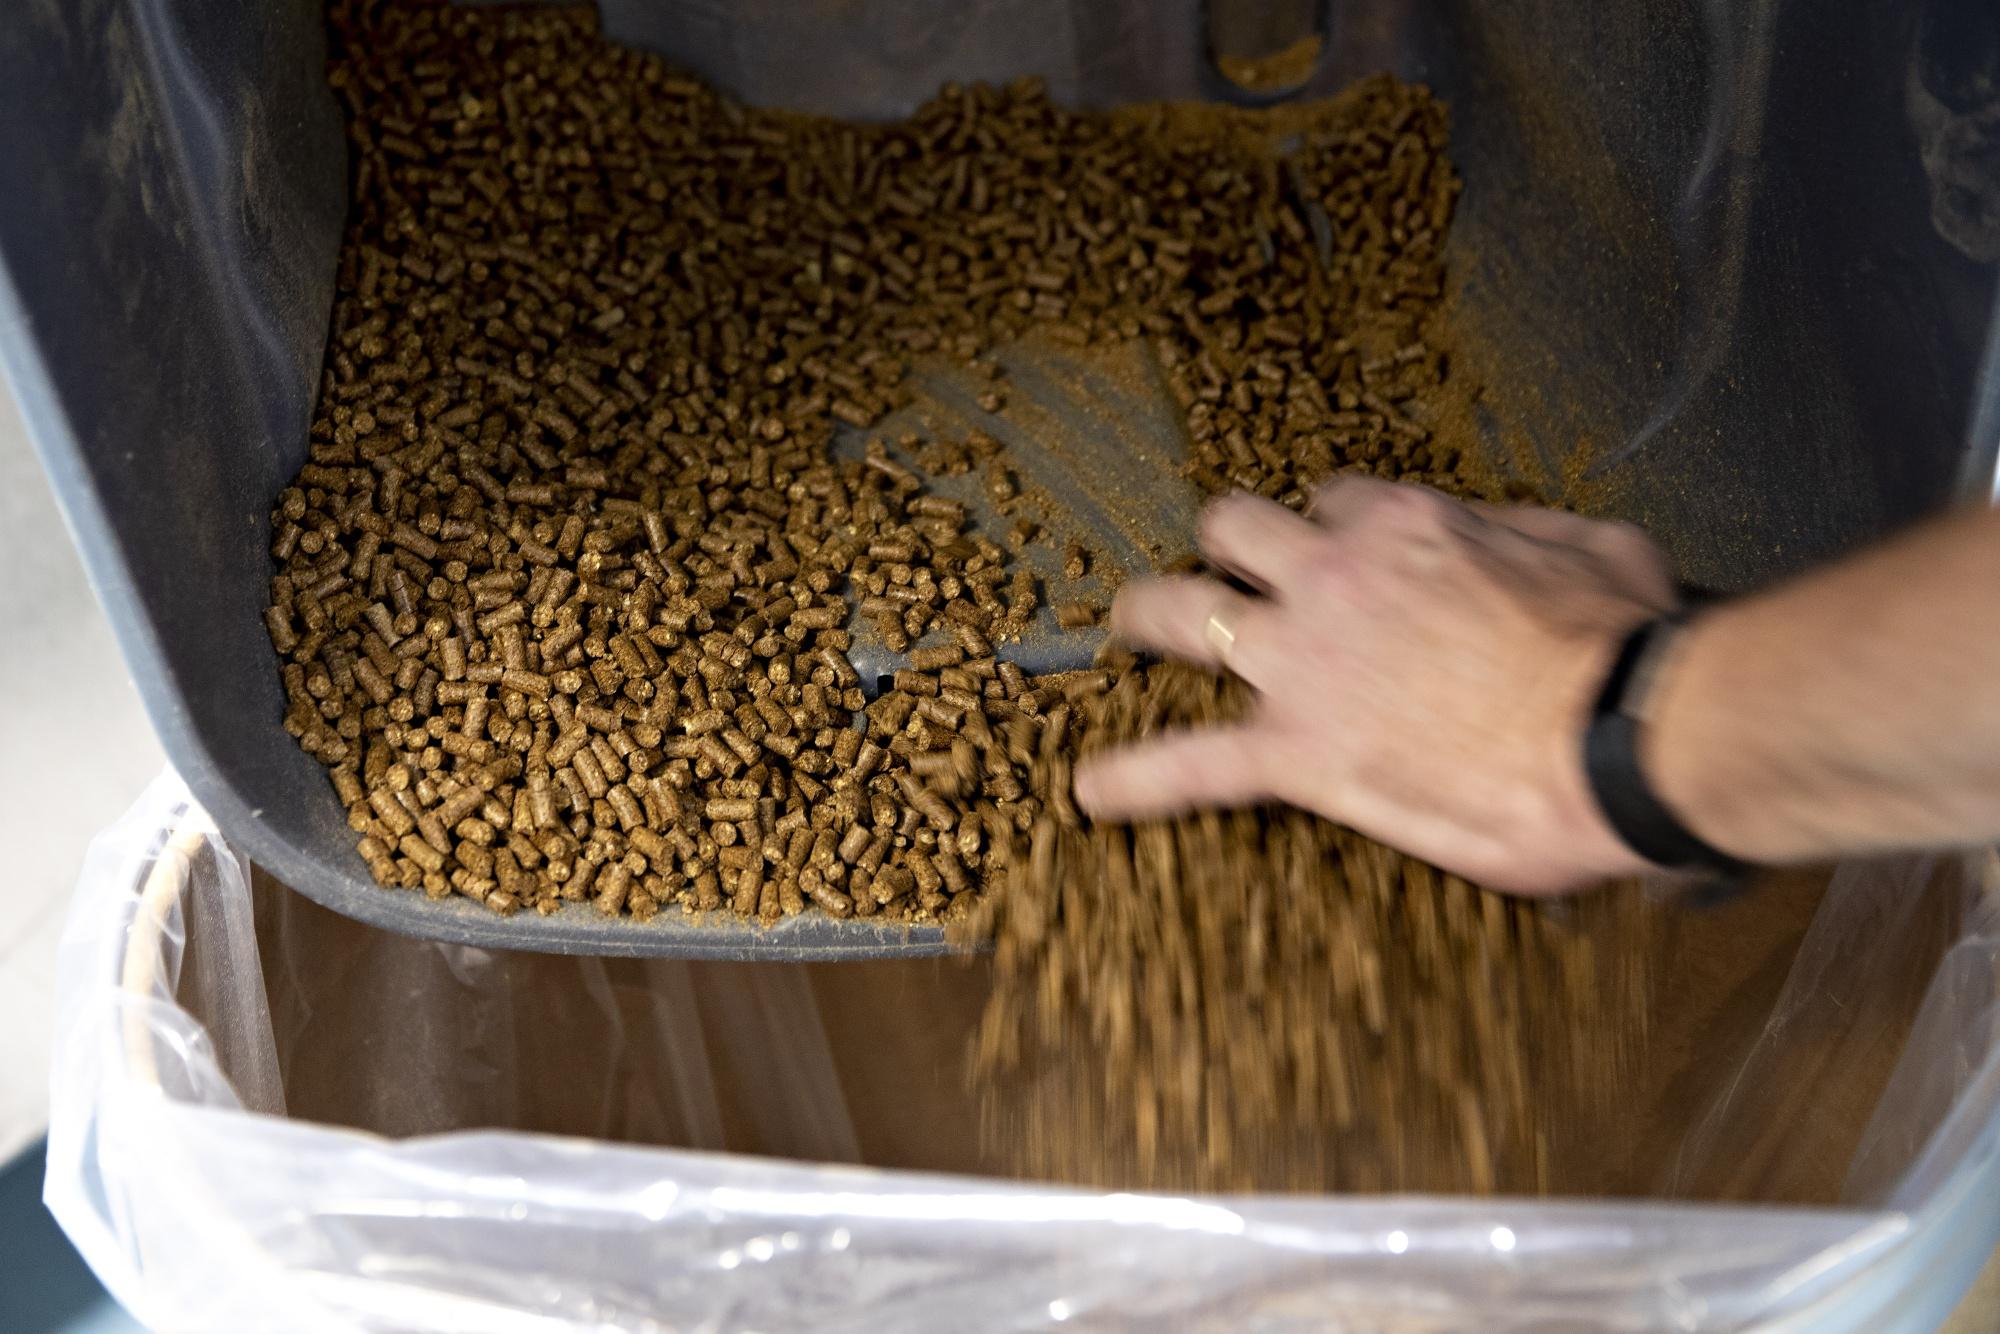 Pet-Food Boom Drives Crop Giant ADM's Push in $91 Billion Market